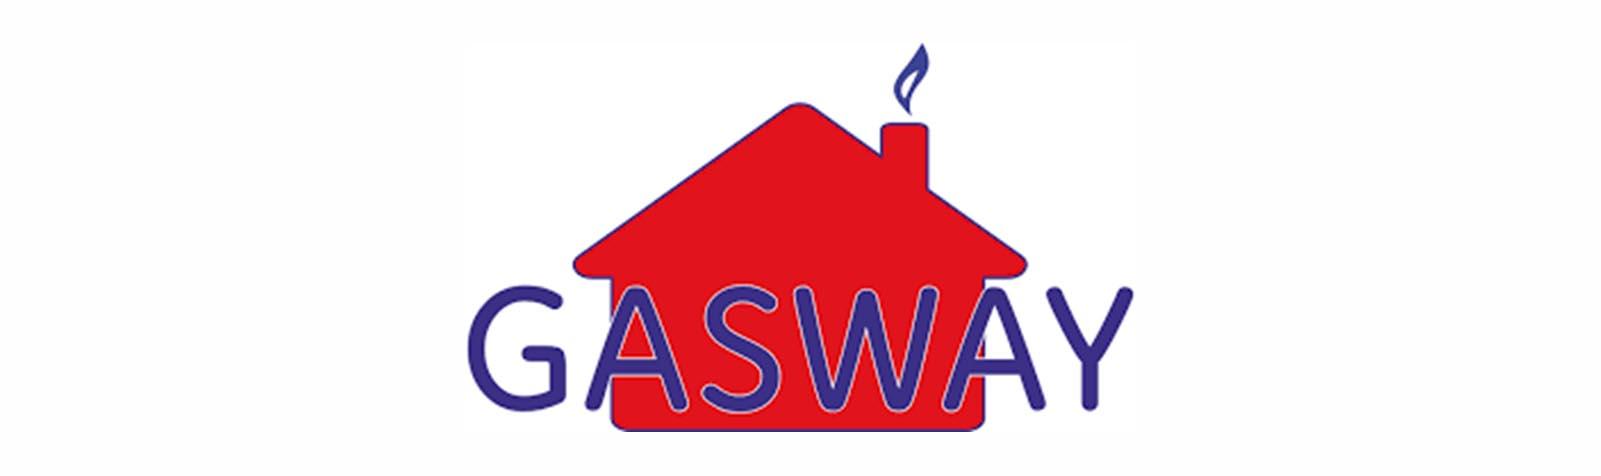 Gasway-banner